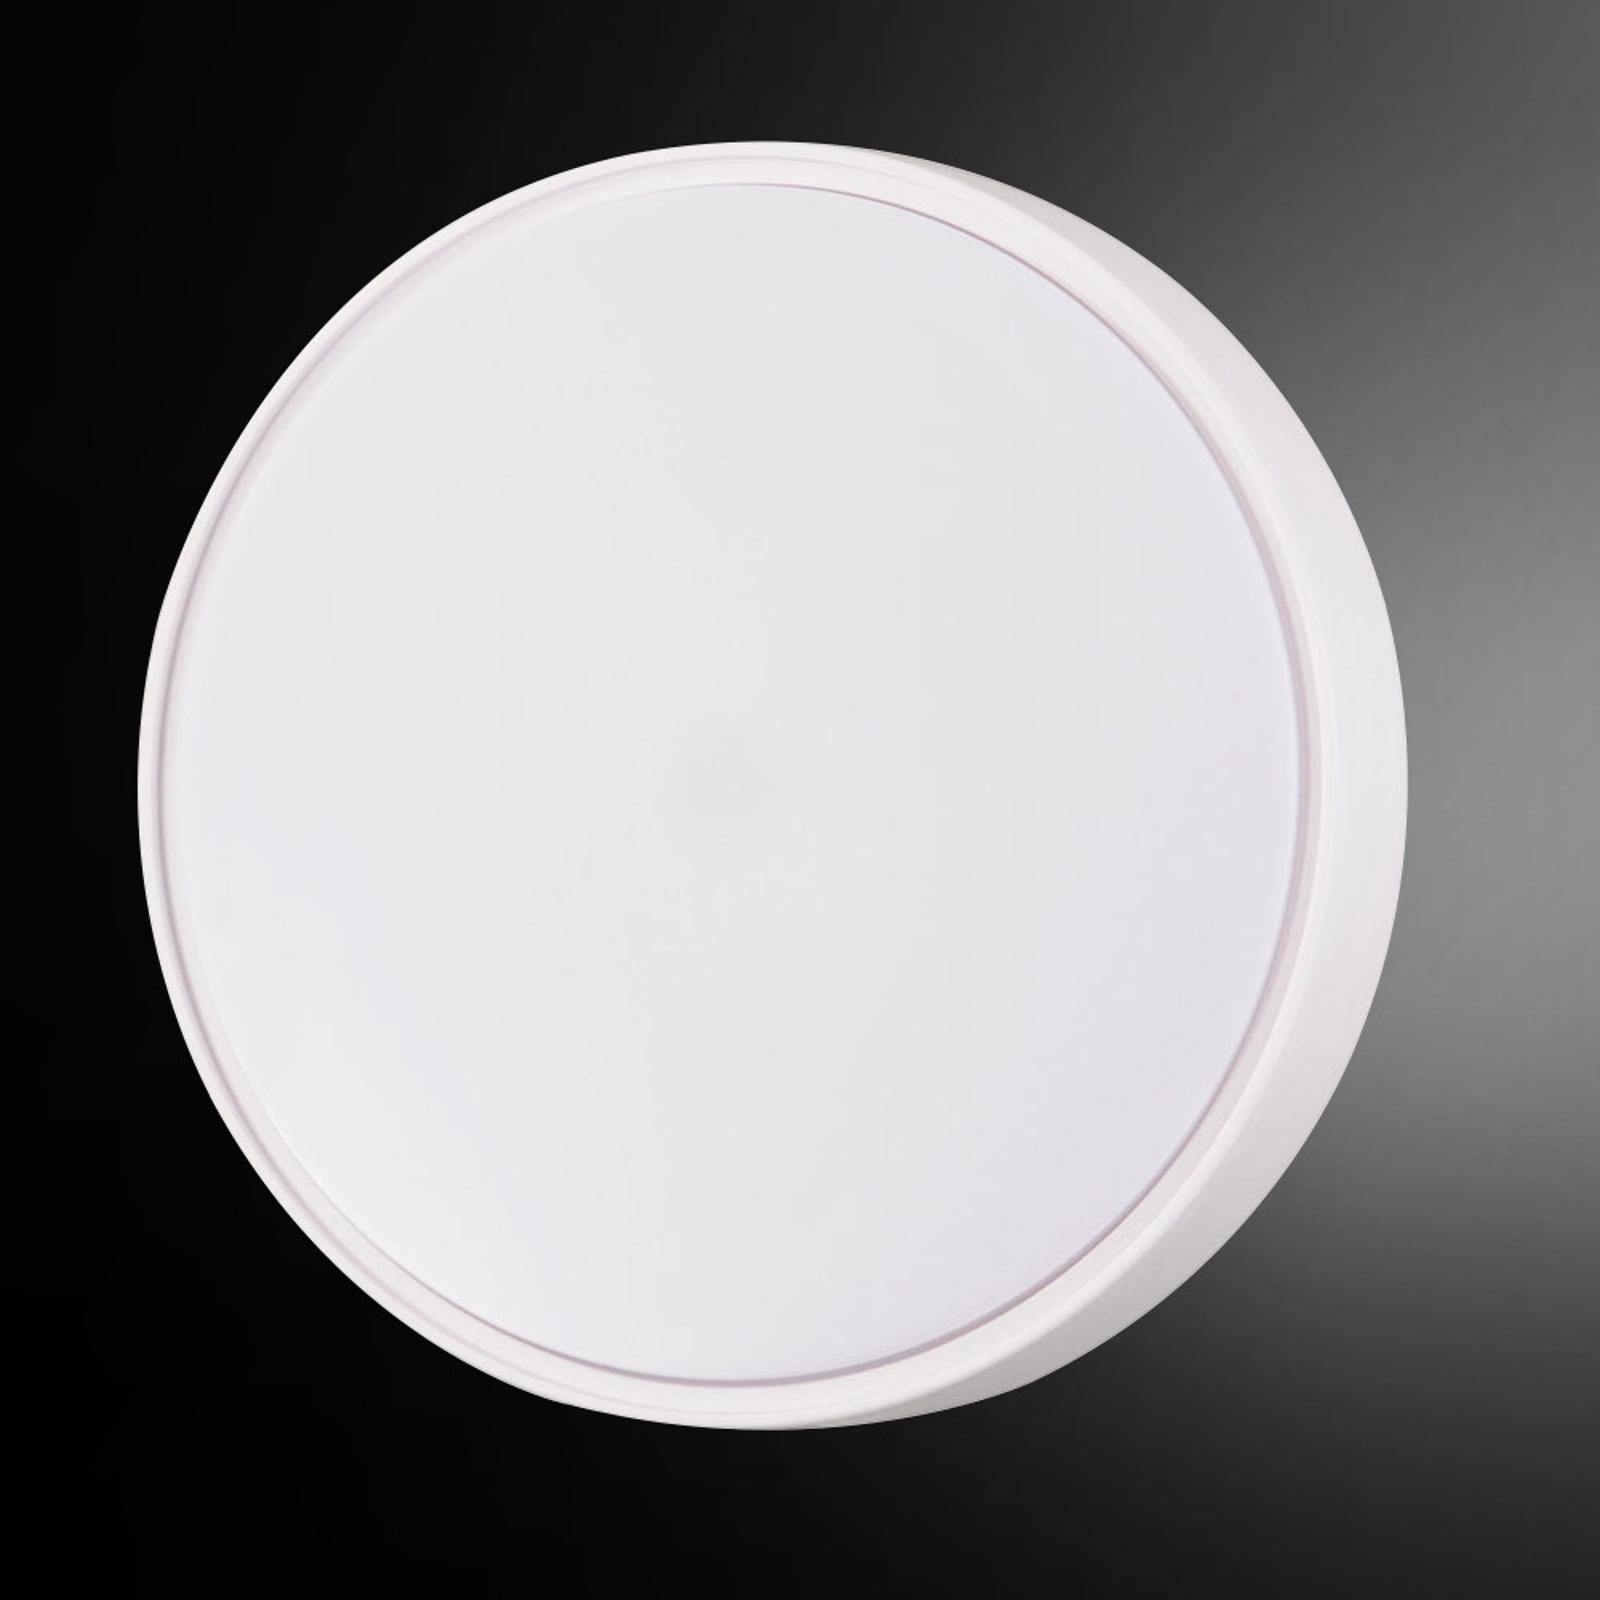 Applique LED lumineuse Hatton IP65, 30cm